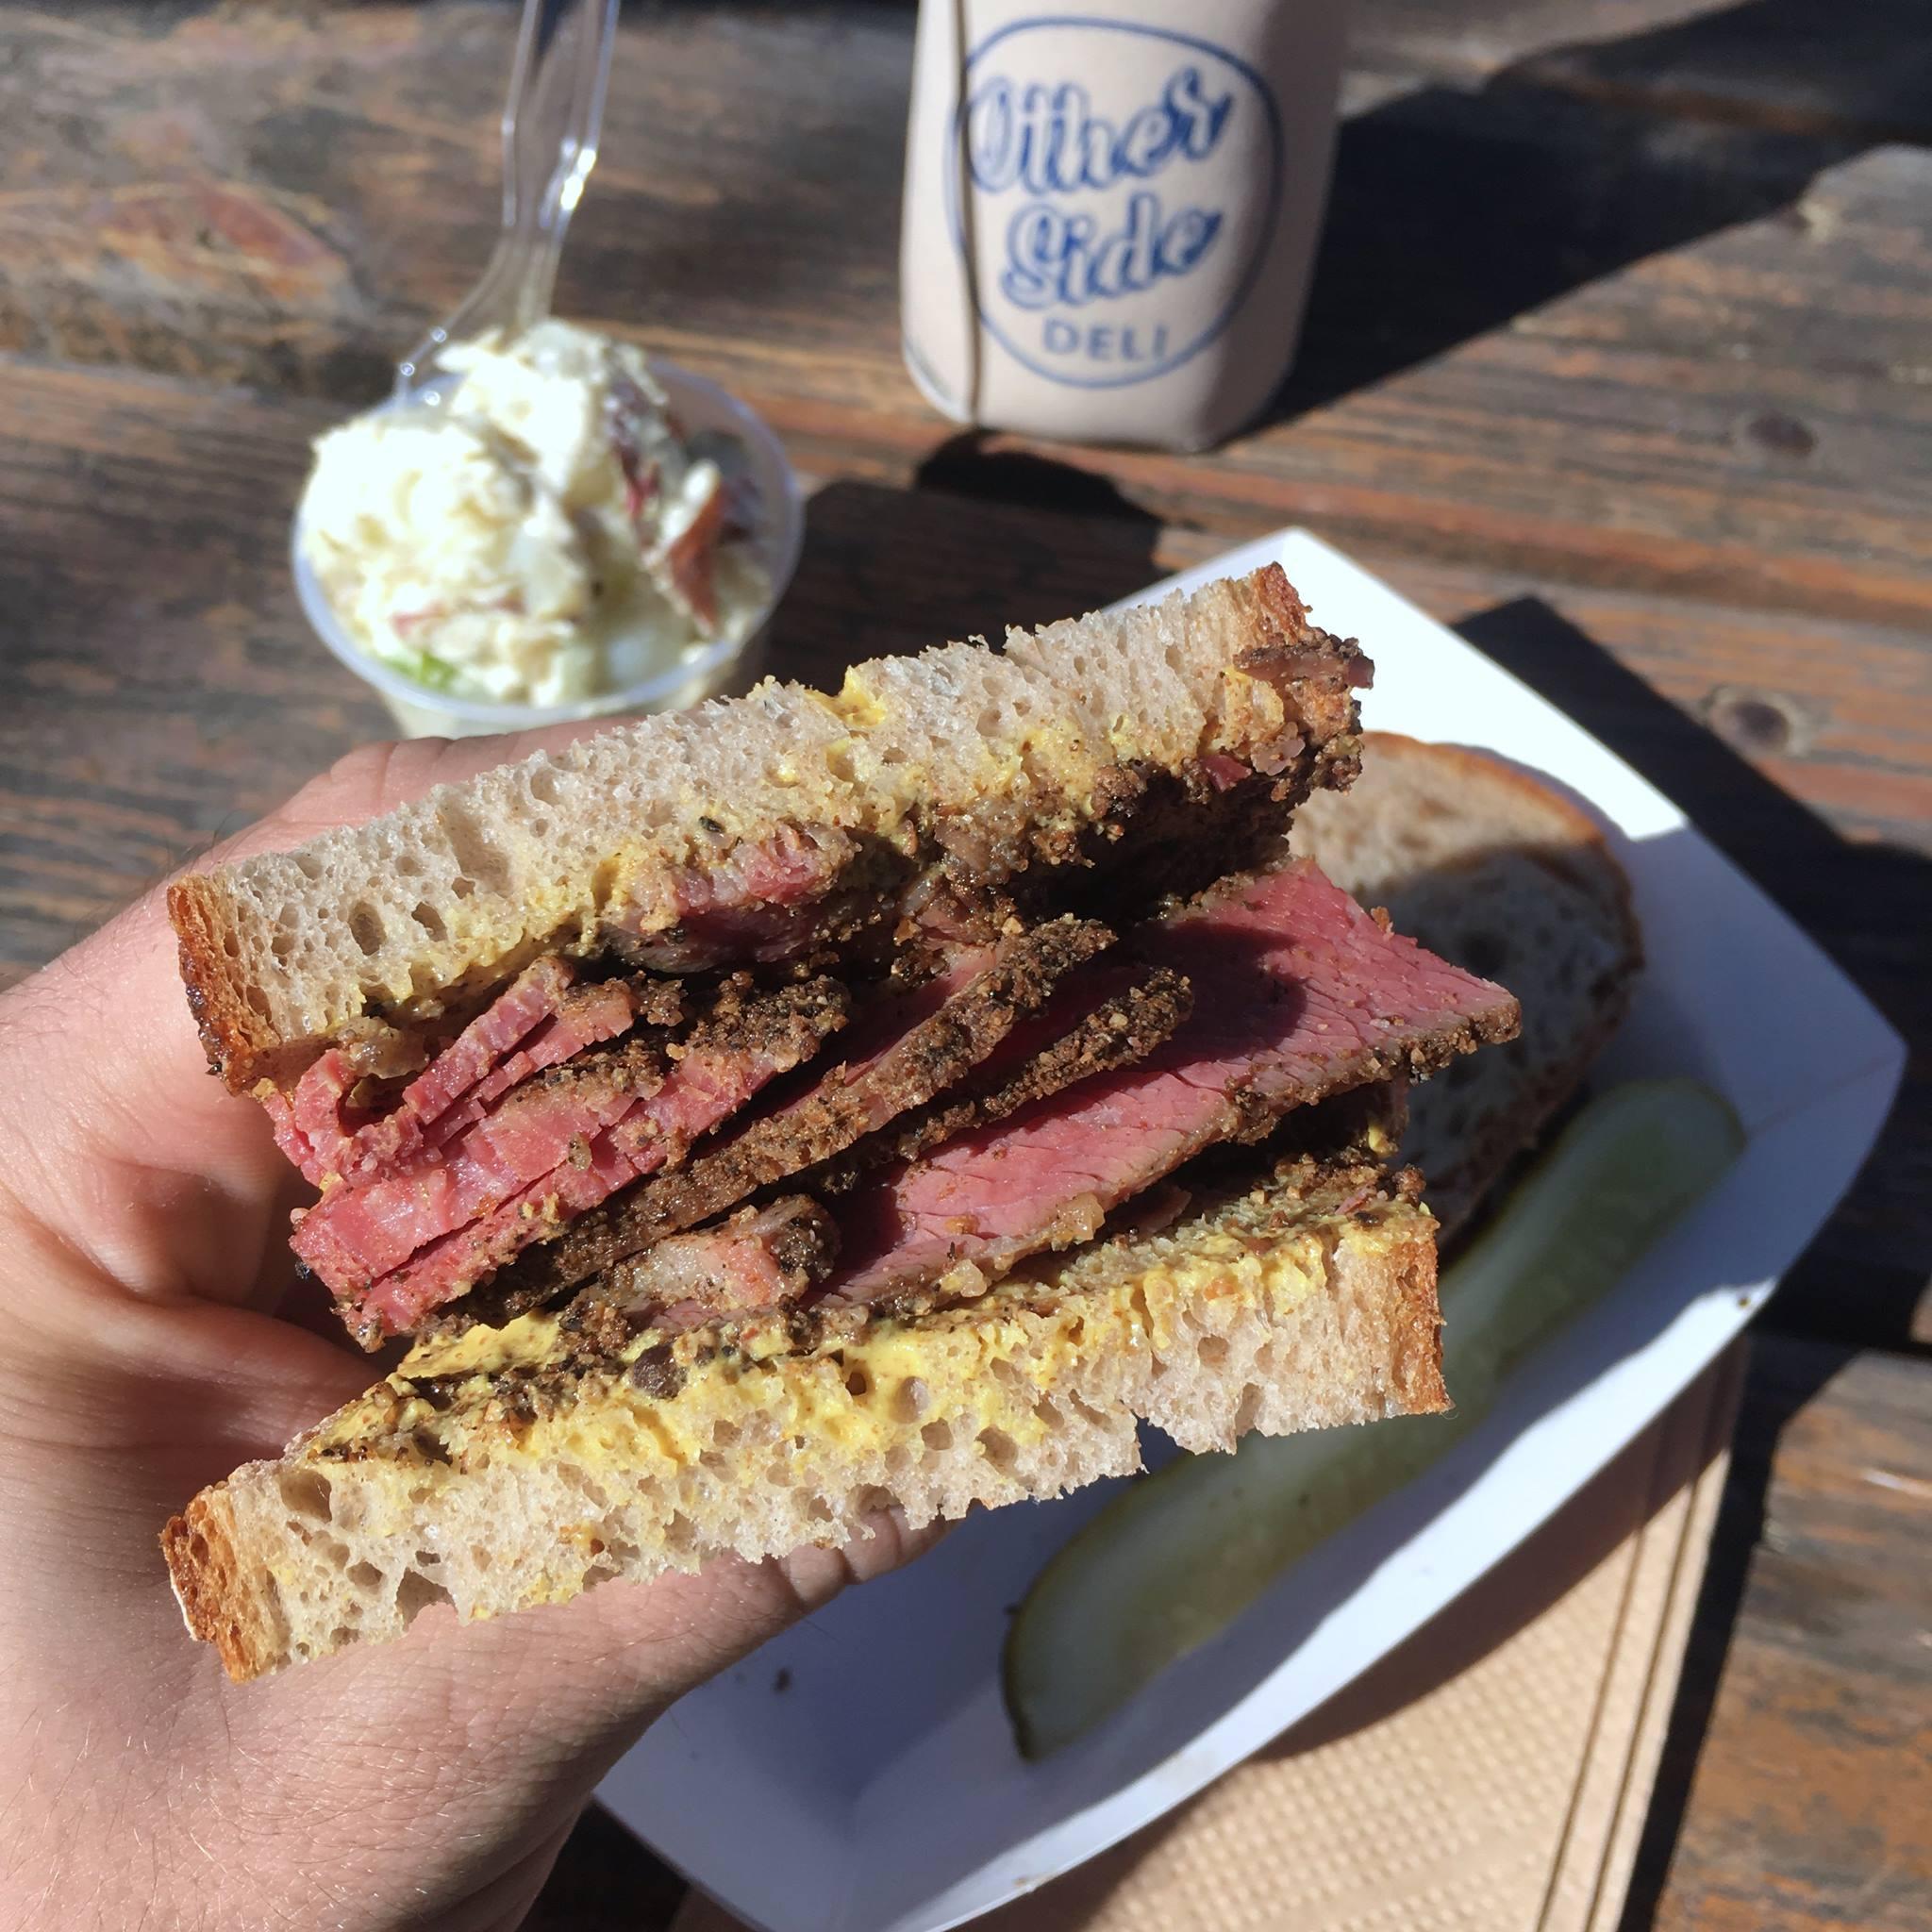 Otherside Deli's pastrami sandwich